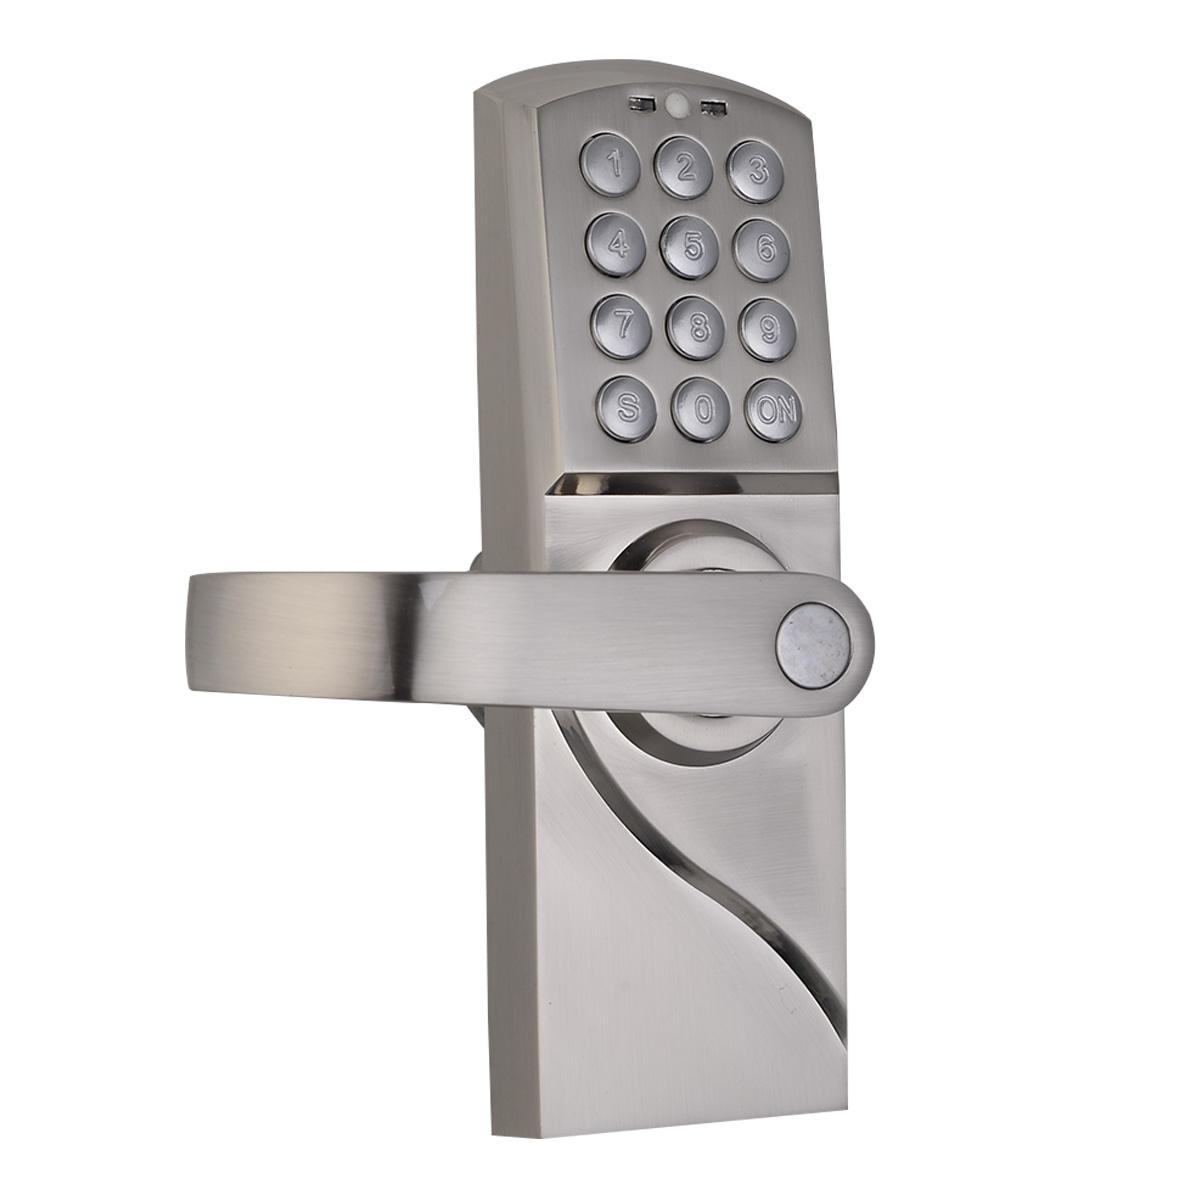 keyless entry door knob photo - 10